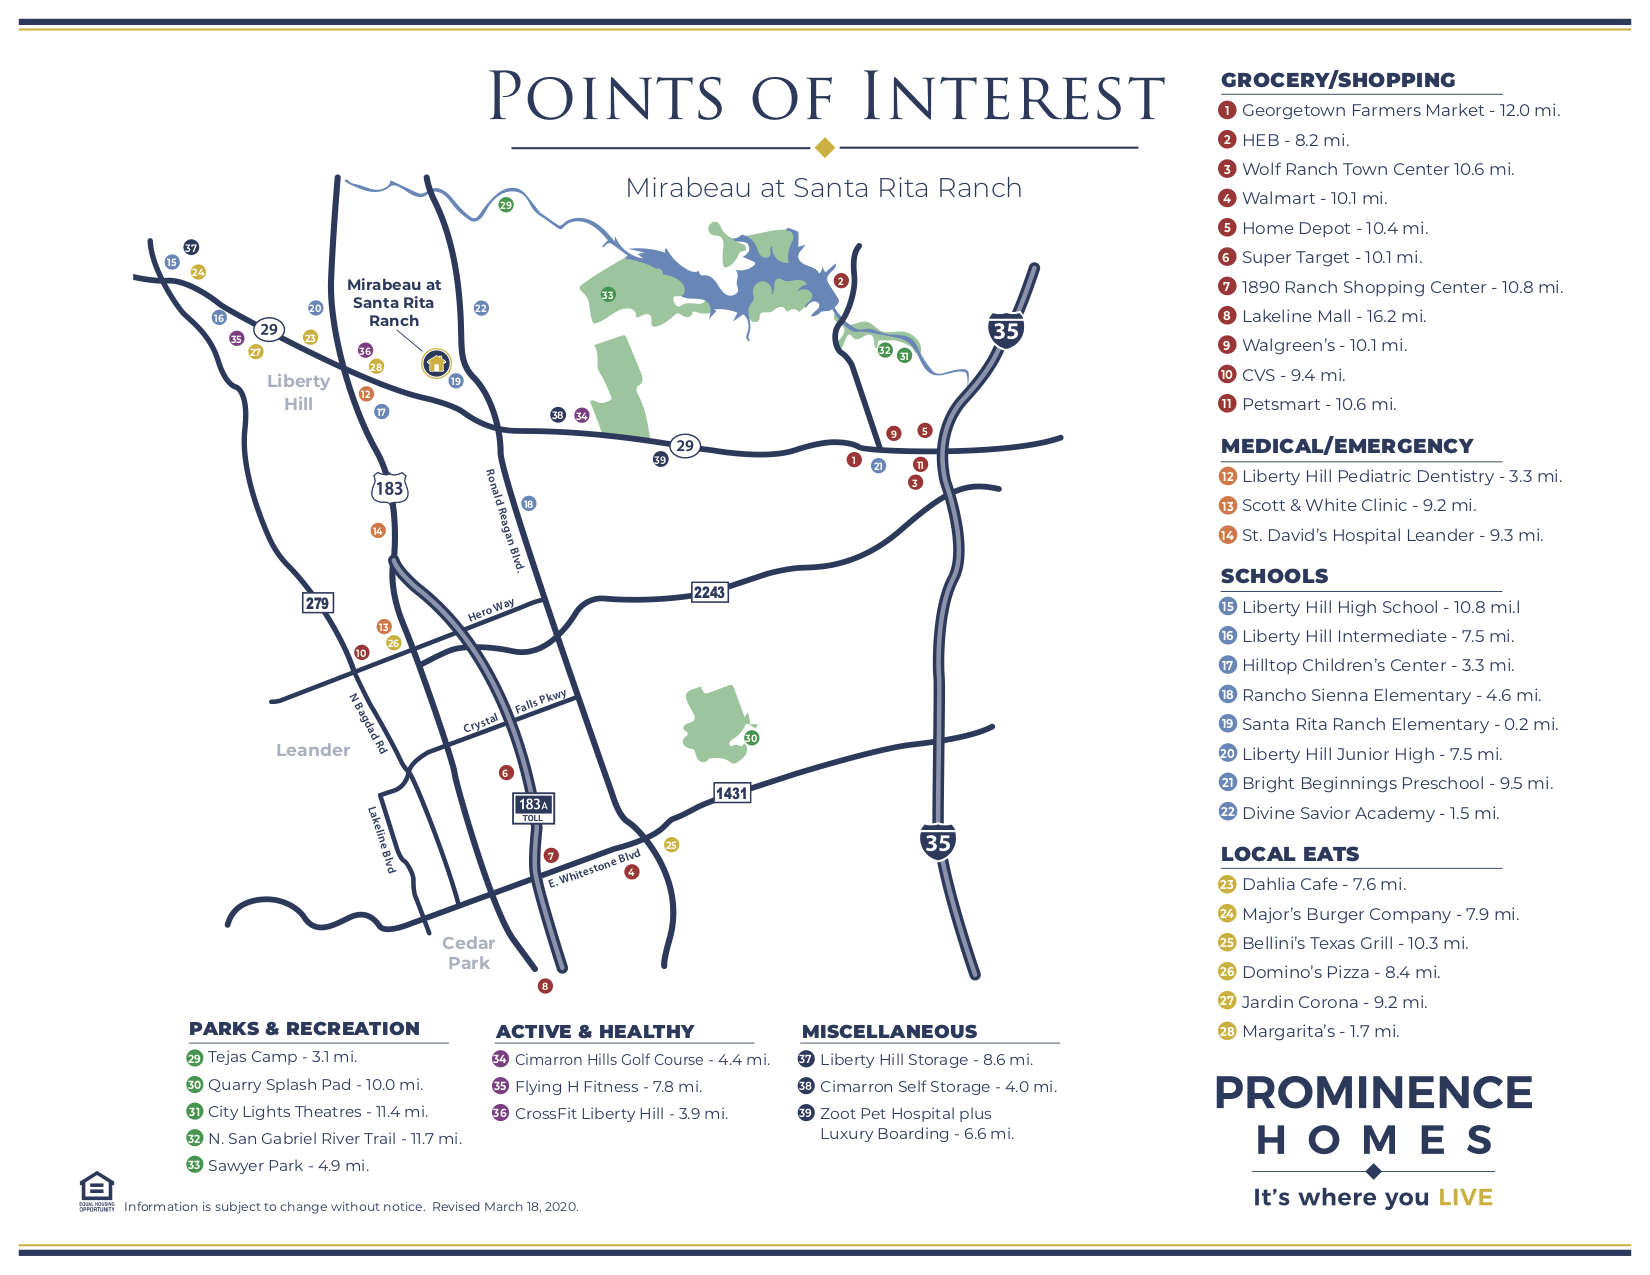 santa rita ranch points of interest map